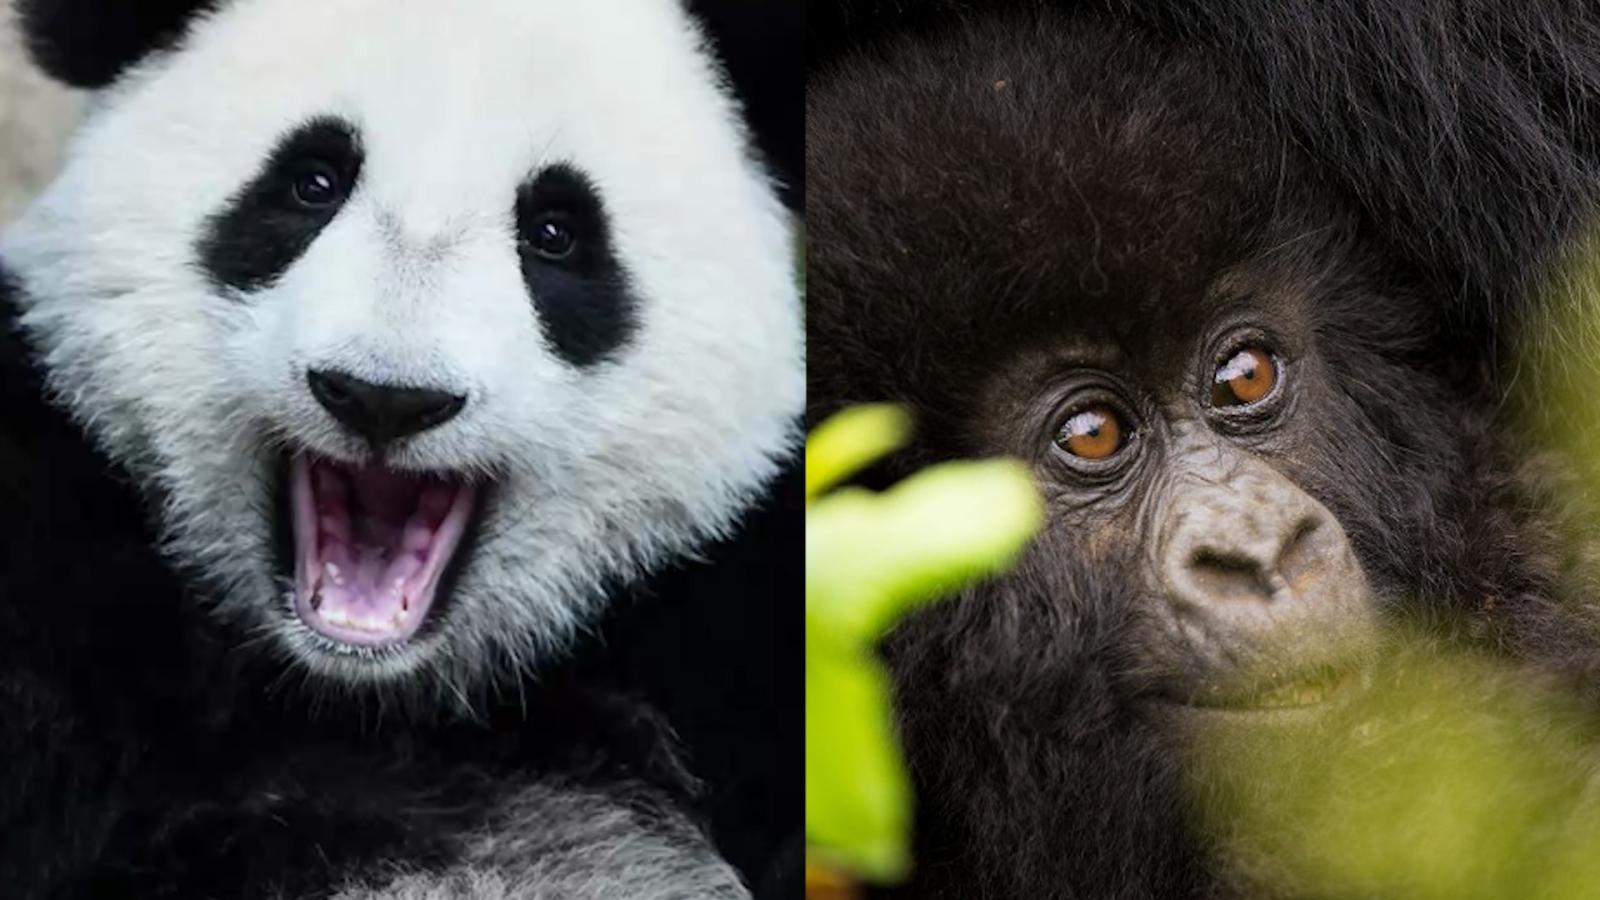 Panda Gorilla